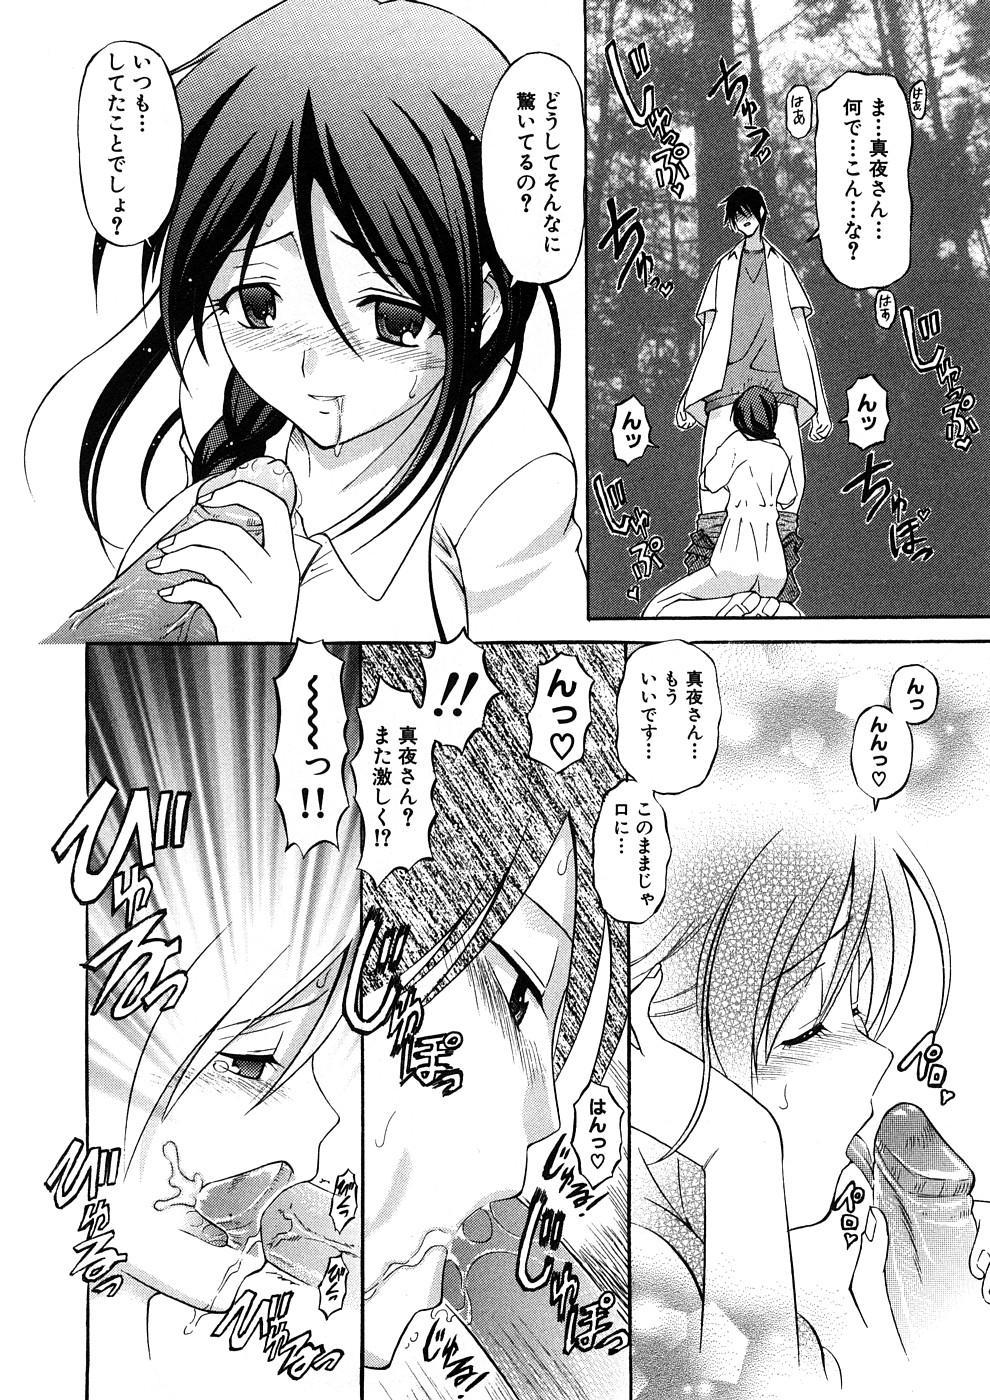 Geki Yaba Anthology Vol. 1 - Naka ni Dashite yo 12